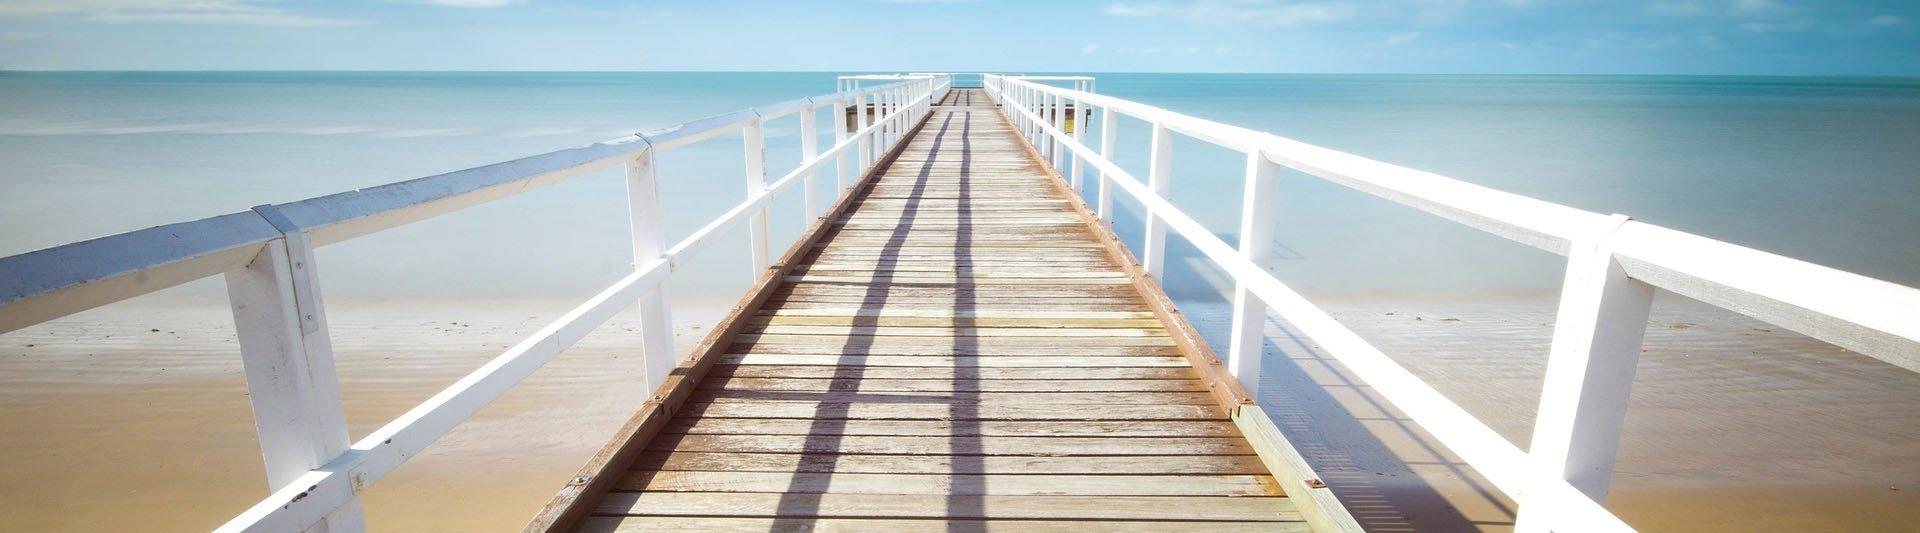 beach pier blog banner